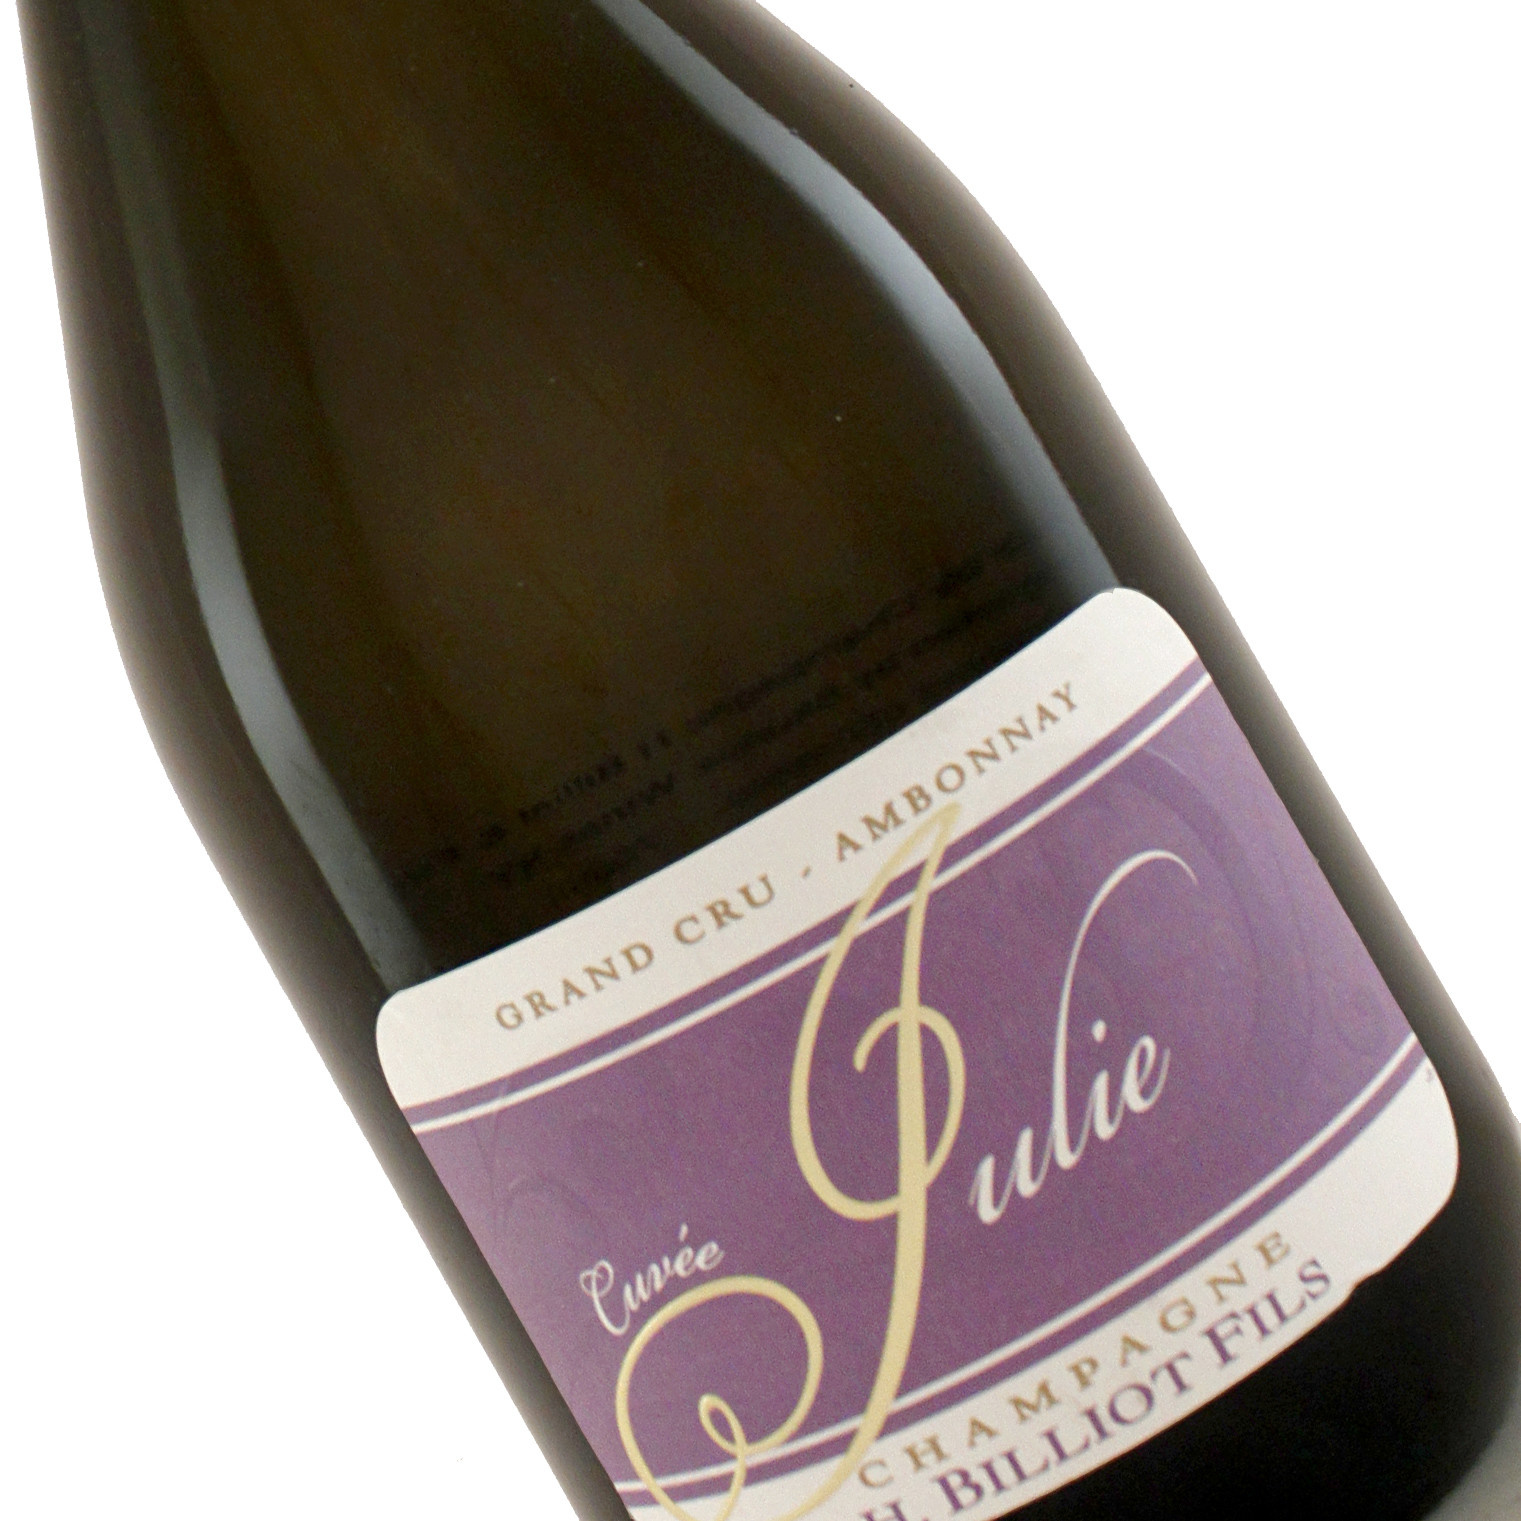 H. Billiot Fils N.V. Cuvee Julie, Champagne Grand Cru, Ambonnay